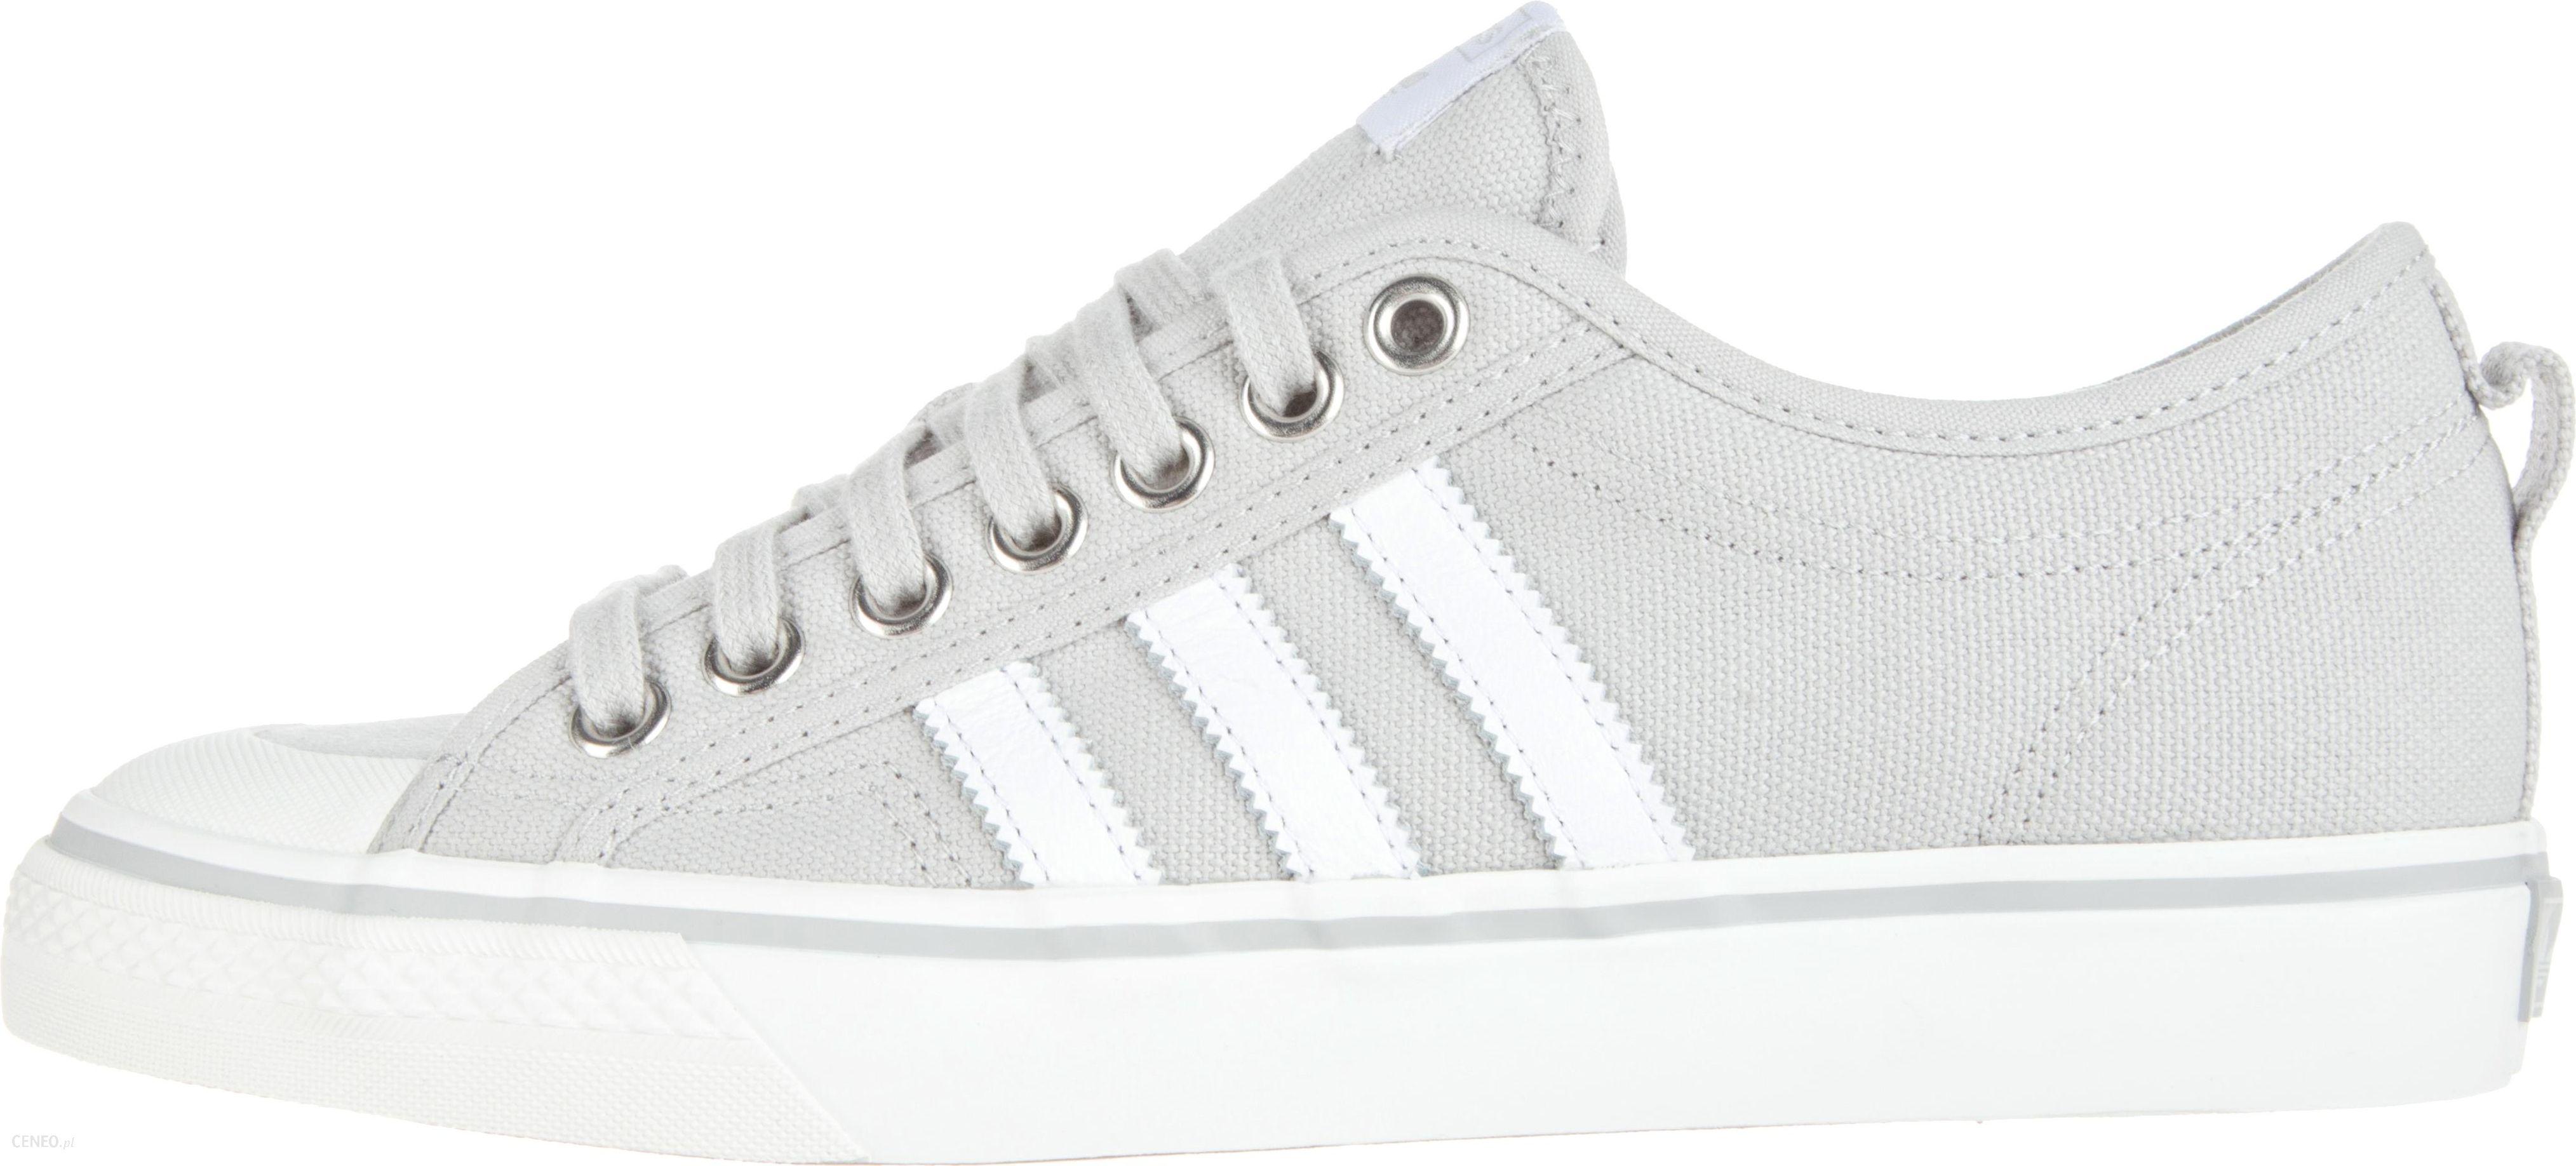 adidas Originals Nizza Low Sneakers Szary 40 23